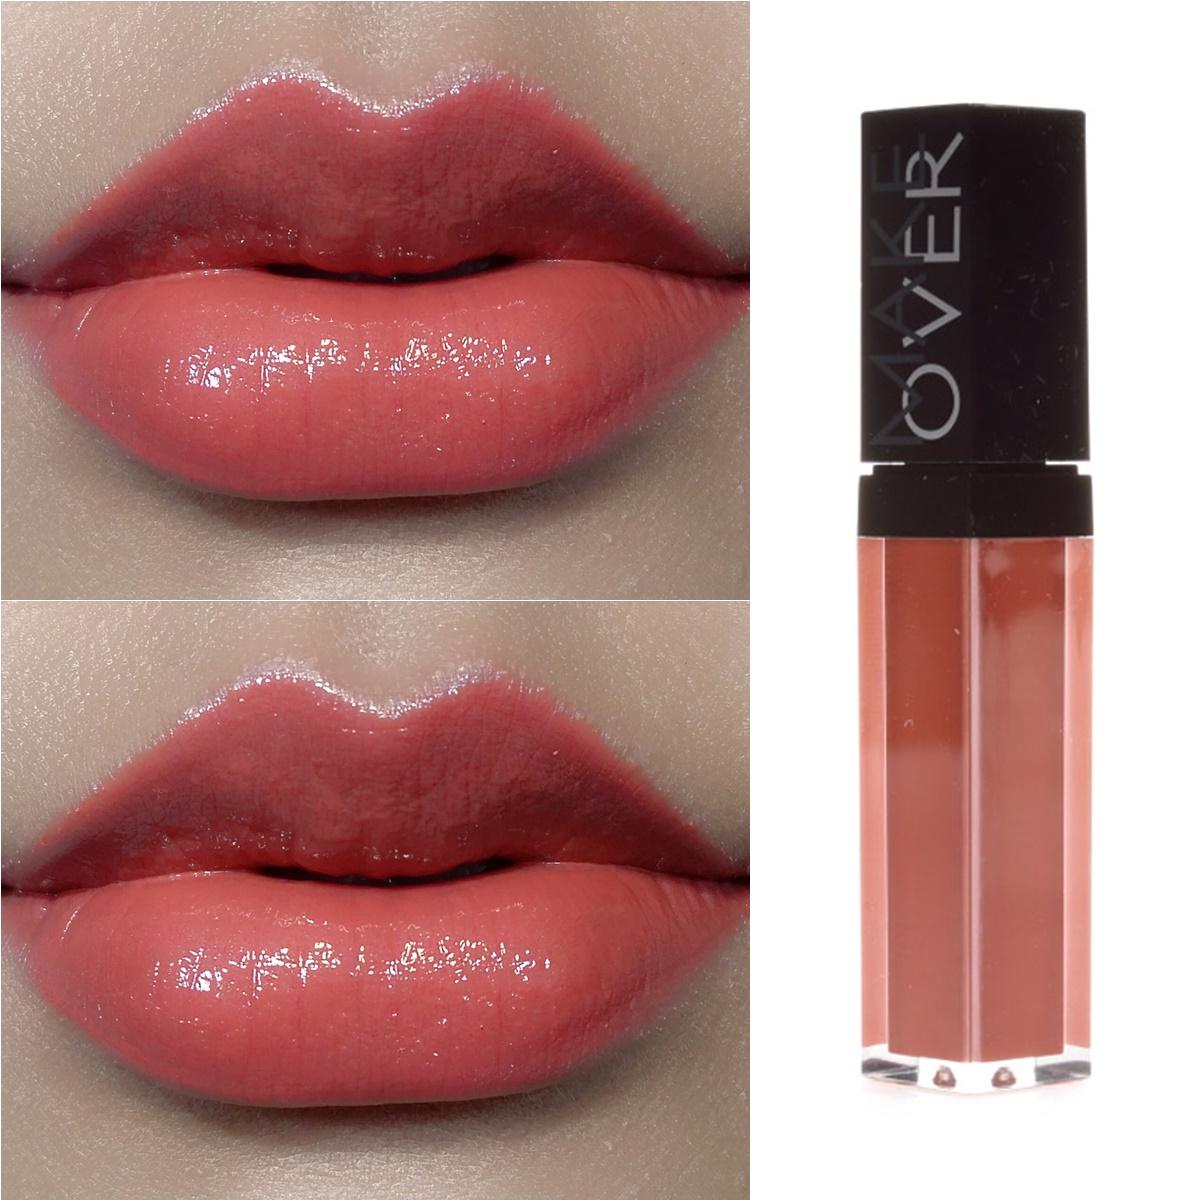 Makeover Liquid Lip Color Review And Swatch Hasgoodlook Make Over Intense Matte Cream Lipstick Lipstik Hazelnut